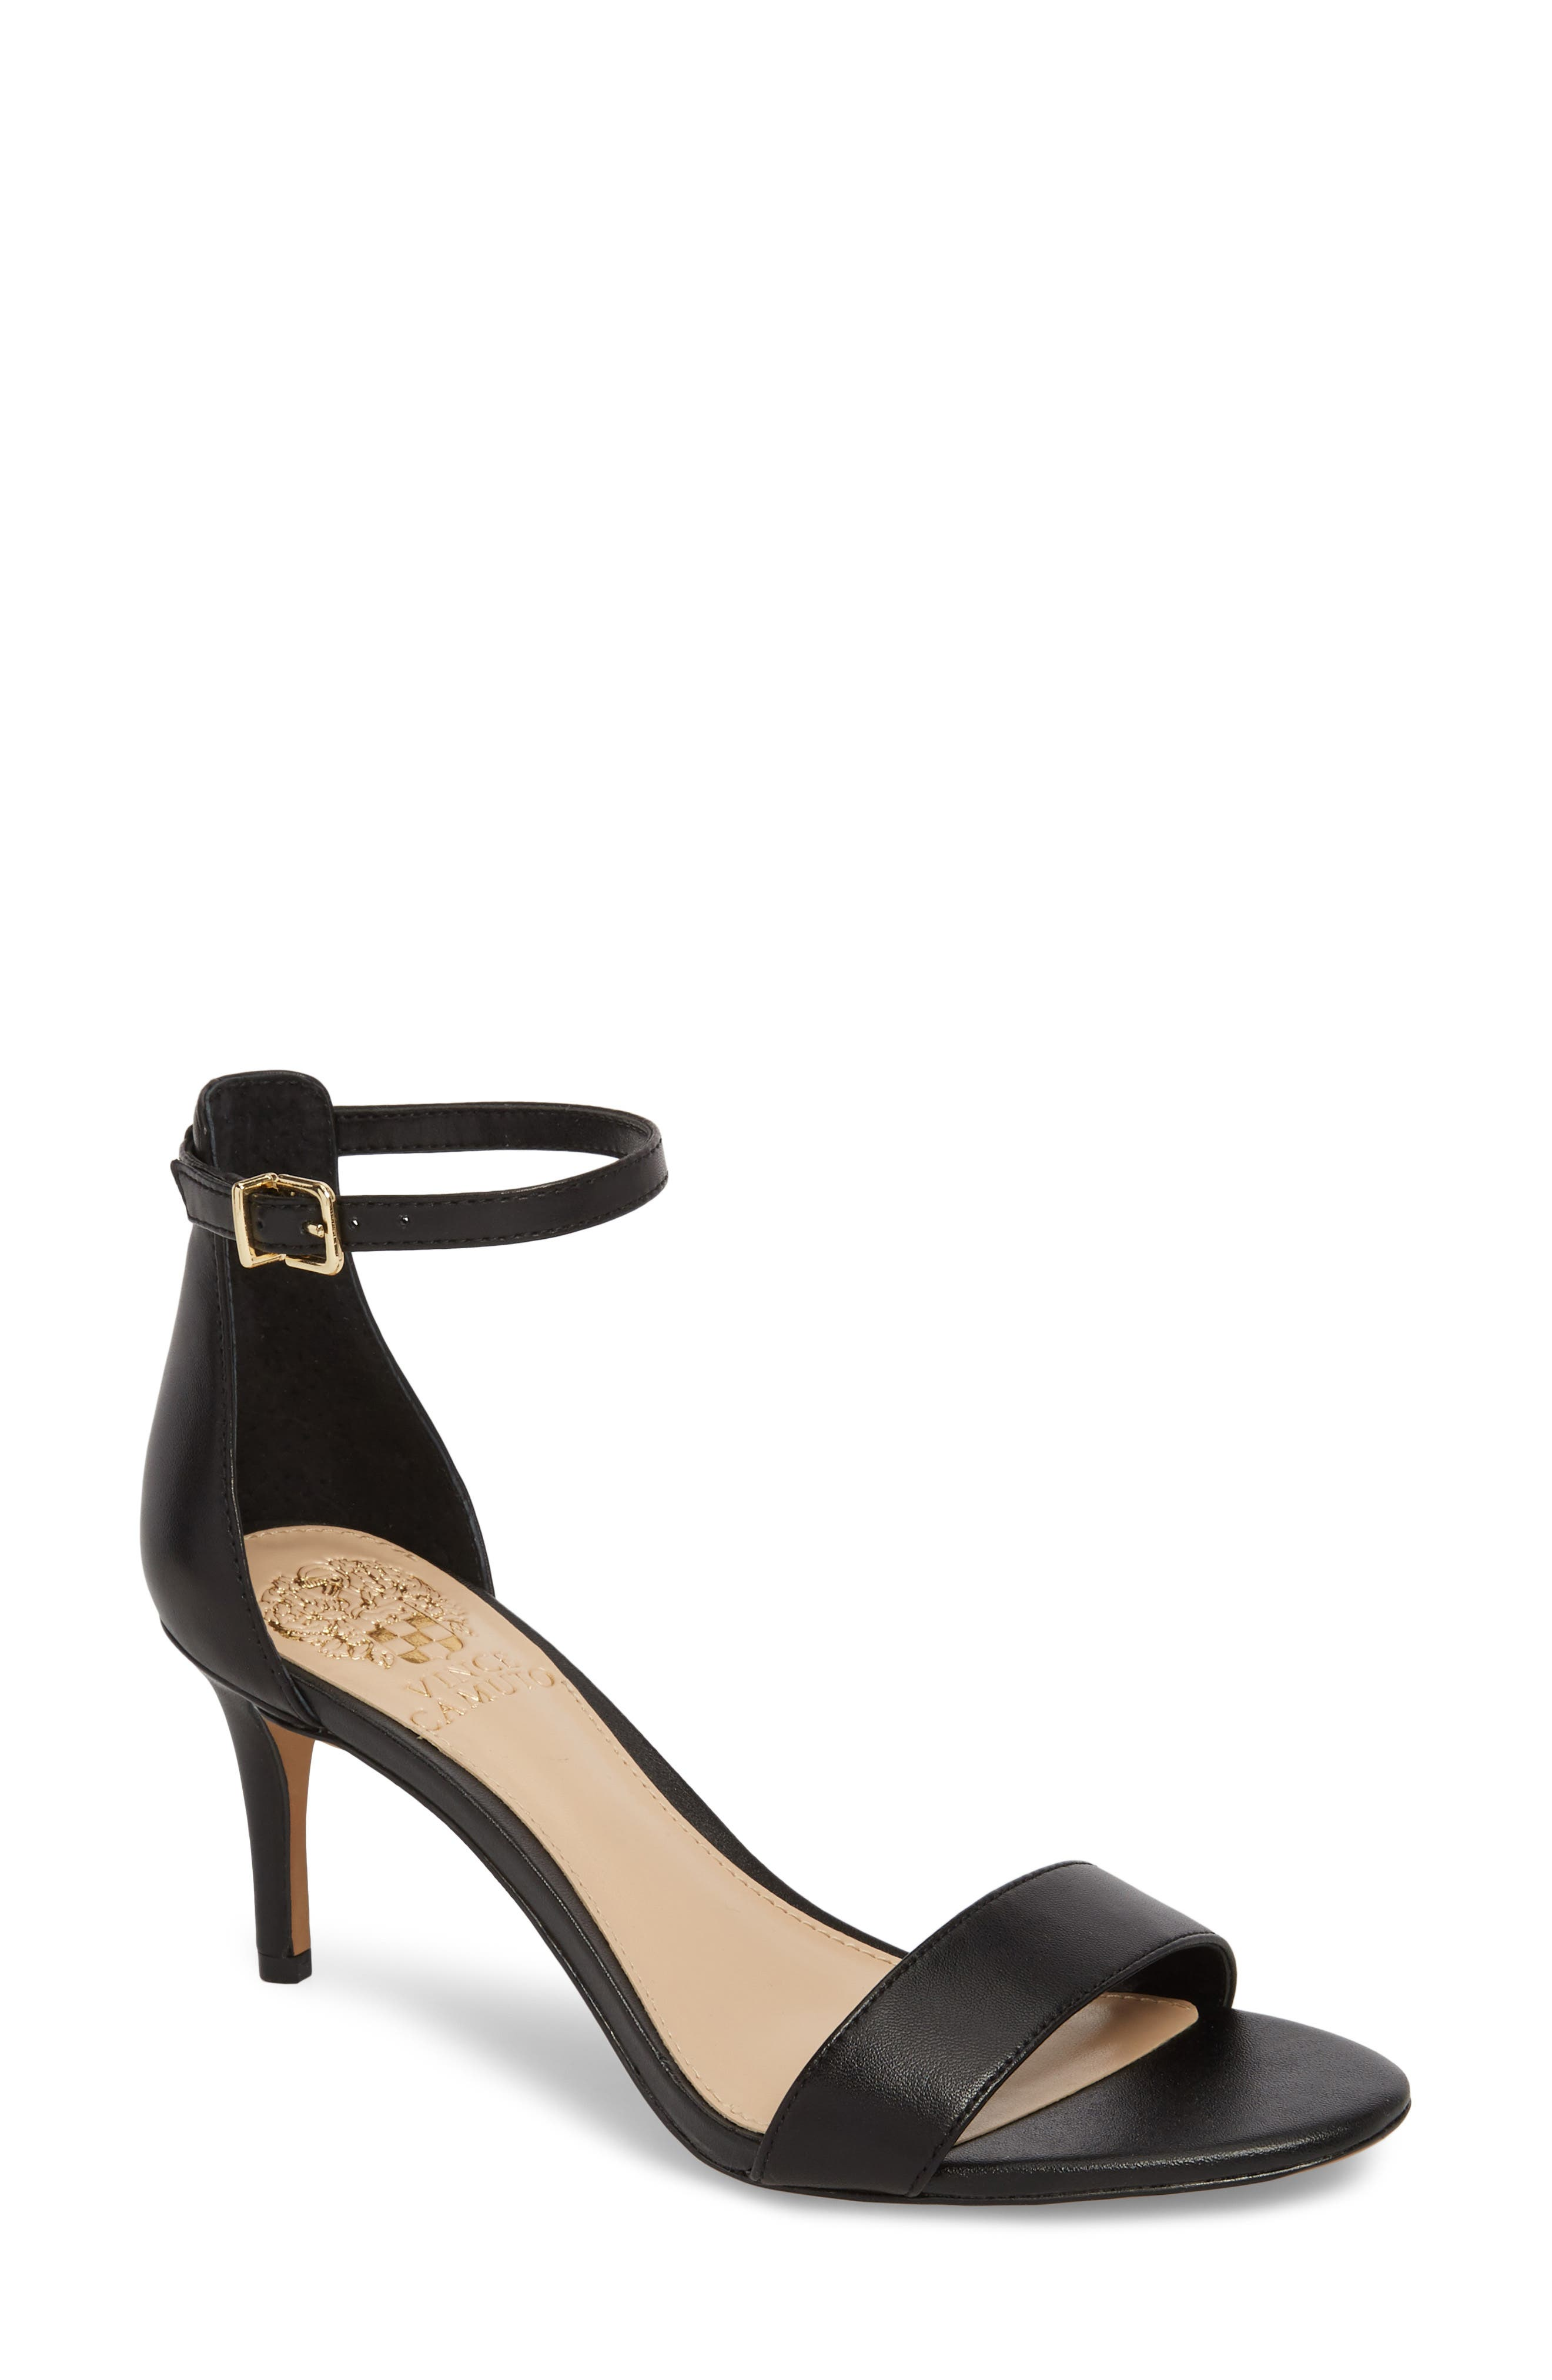 Sebatini Sandal,                         Main,                         color, BLACK LEATHER